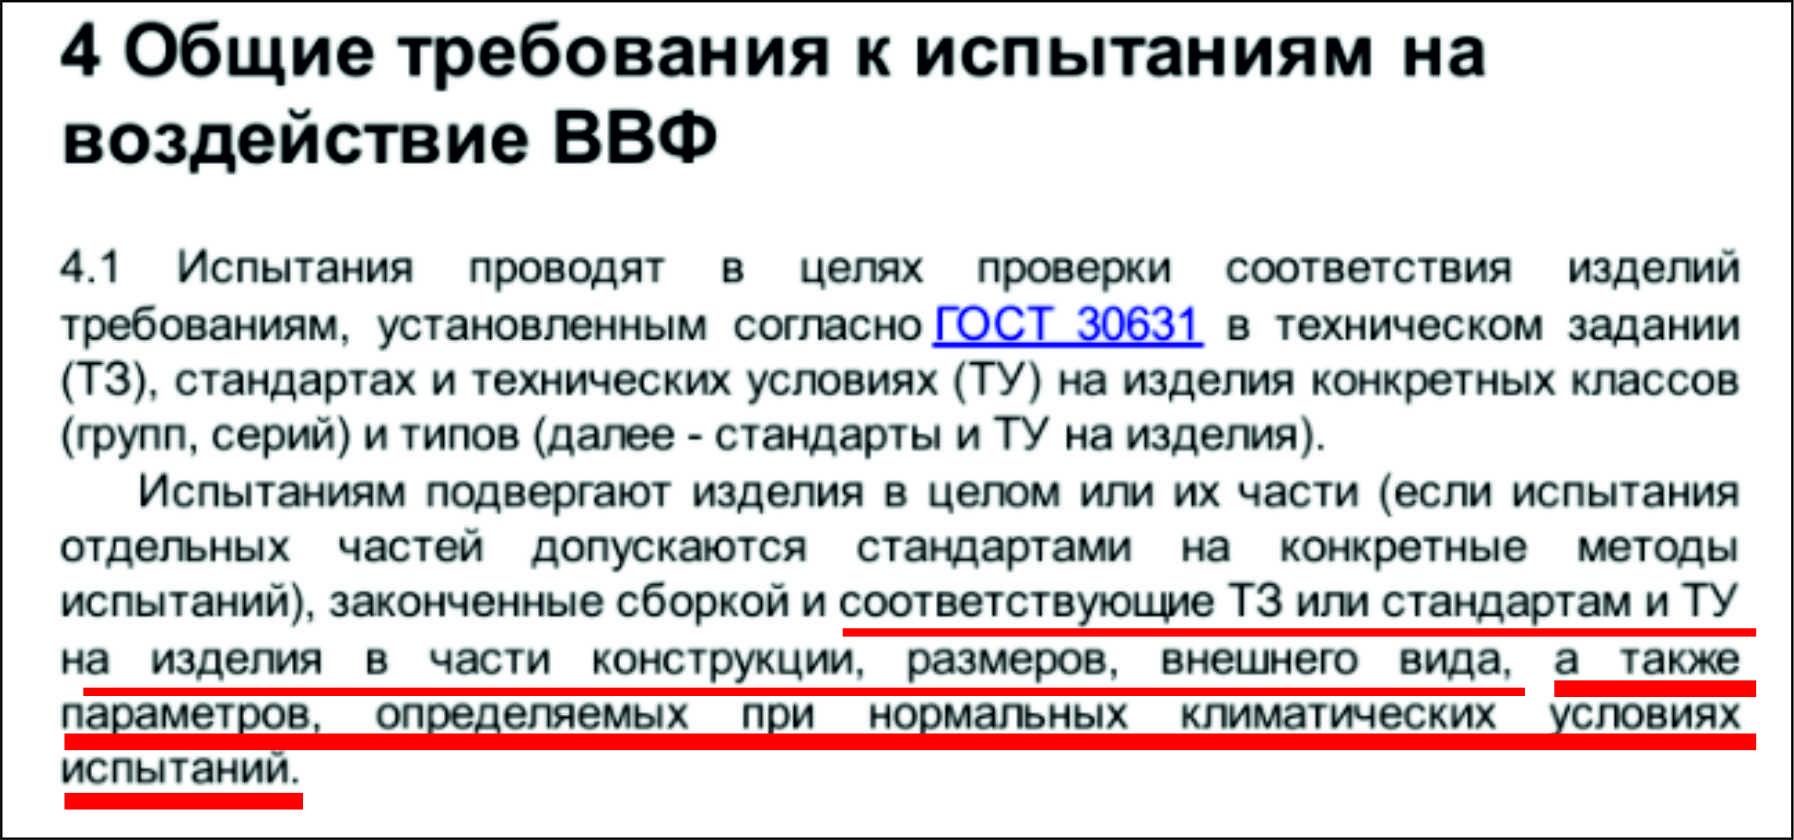 http://images.vfl.ru/ii/1619685758/31abdceb/34266887.jpg